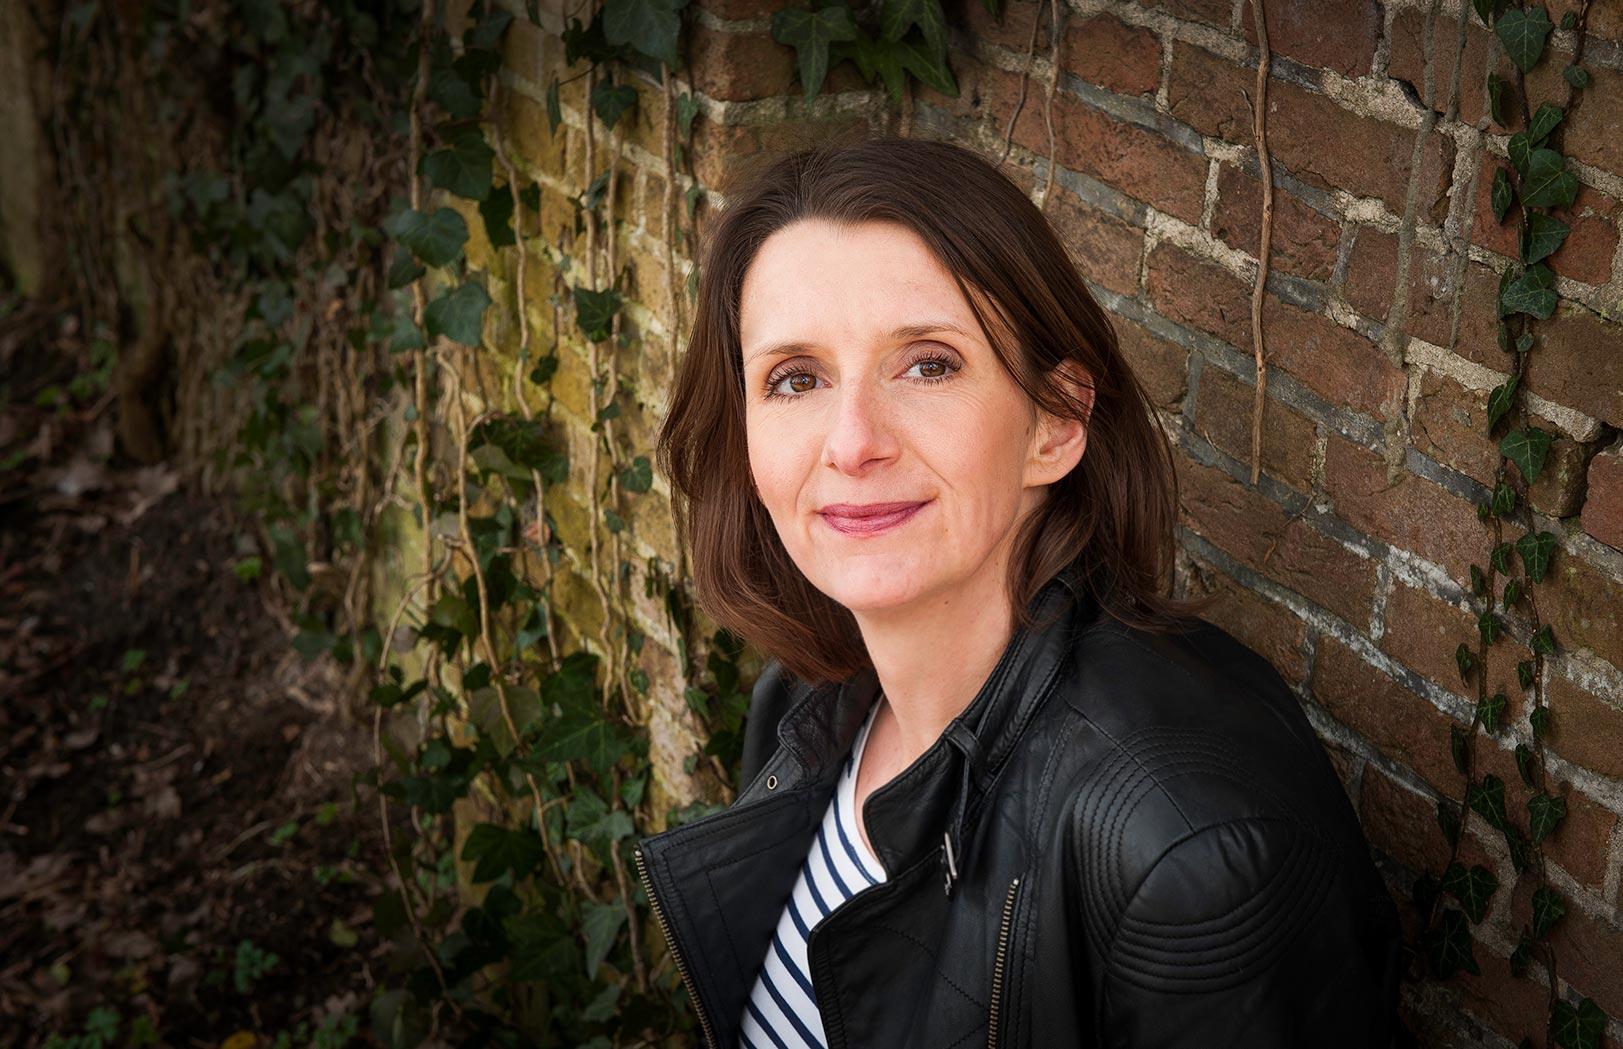 Kirsten Schults ervaring Grip op bedrijfsgroei